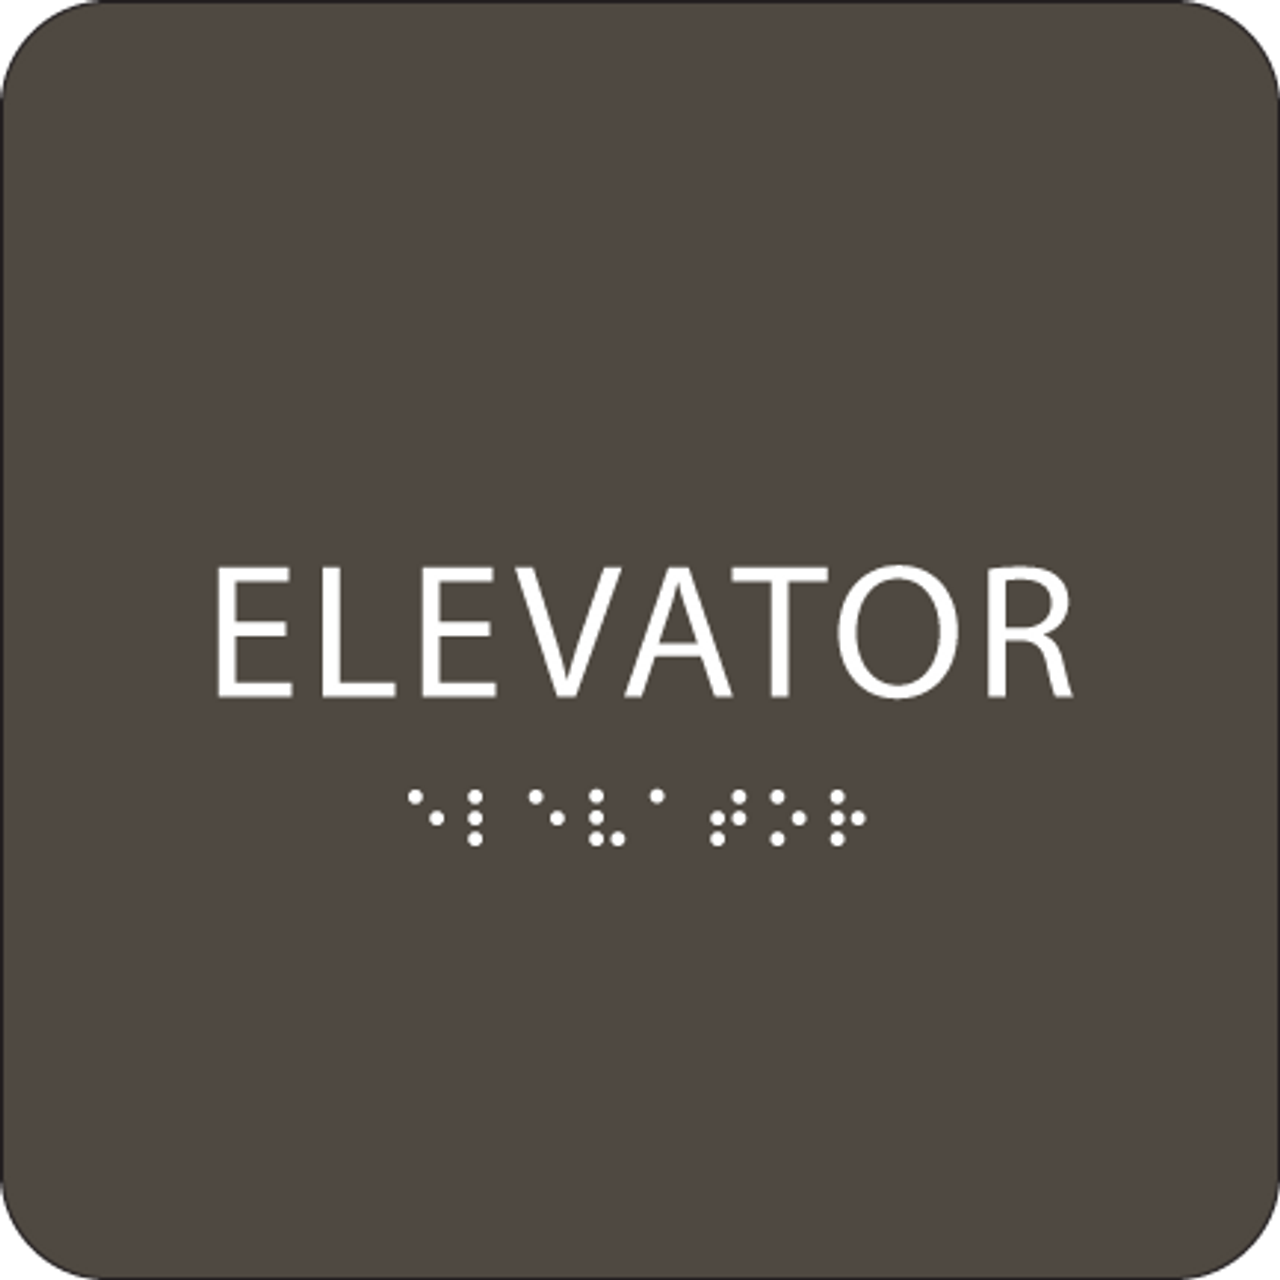 "Elevator ADA Sign - 6"" x 6"""